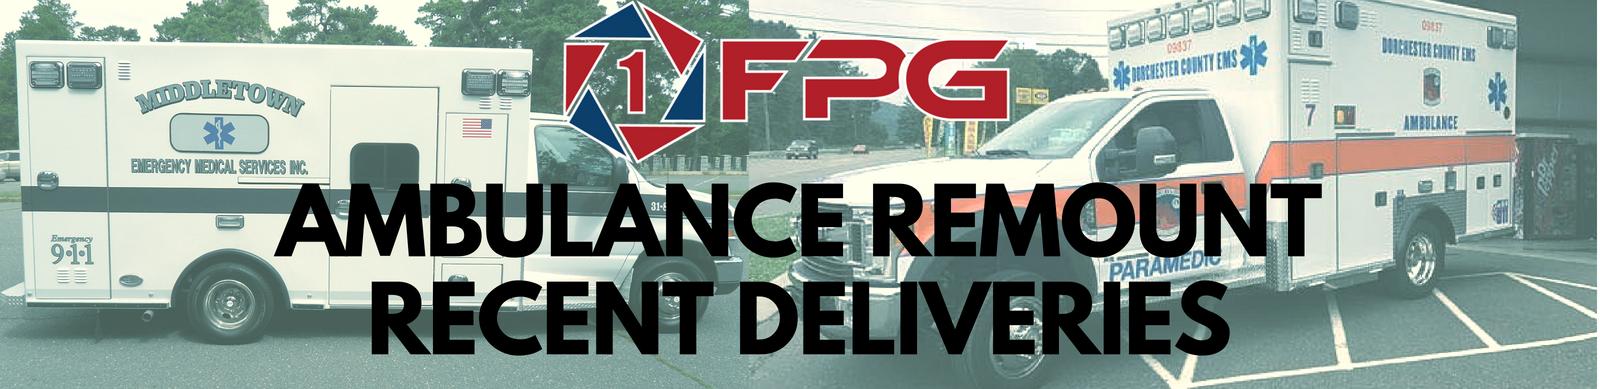 remount recent deliveries-1.png